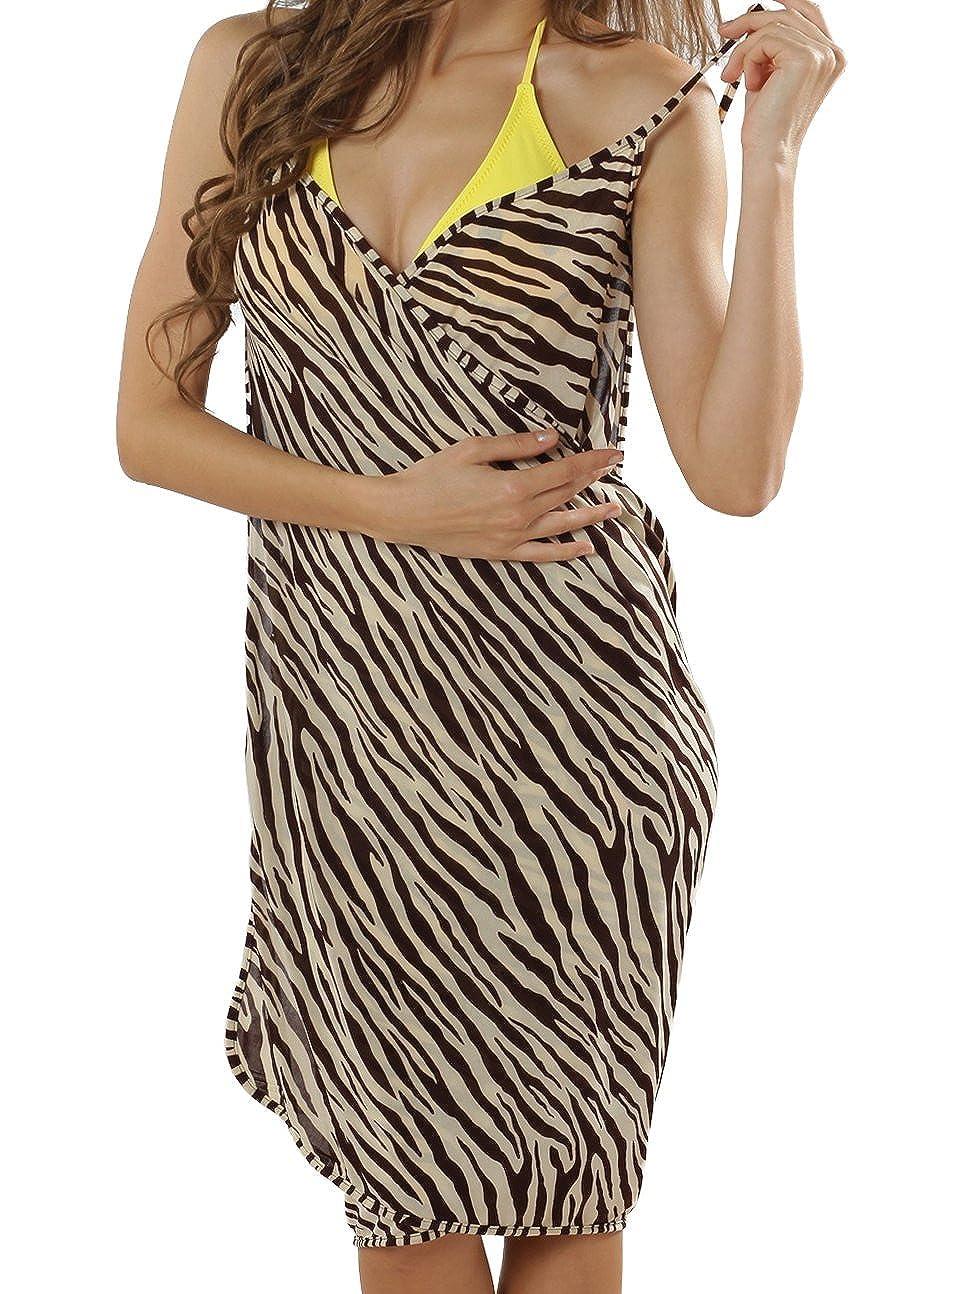 fbe9e7b06d92c Top1: Beach Coverups for Women Scarf Beach Towel Dresses Wraps Tank Top Swimsuit  Bikini Stylish Cover Ups